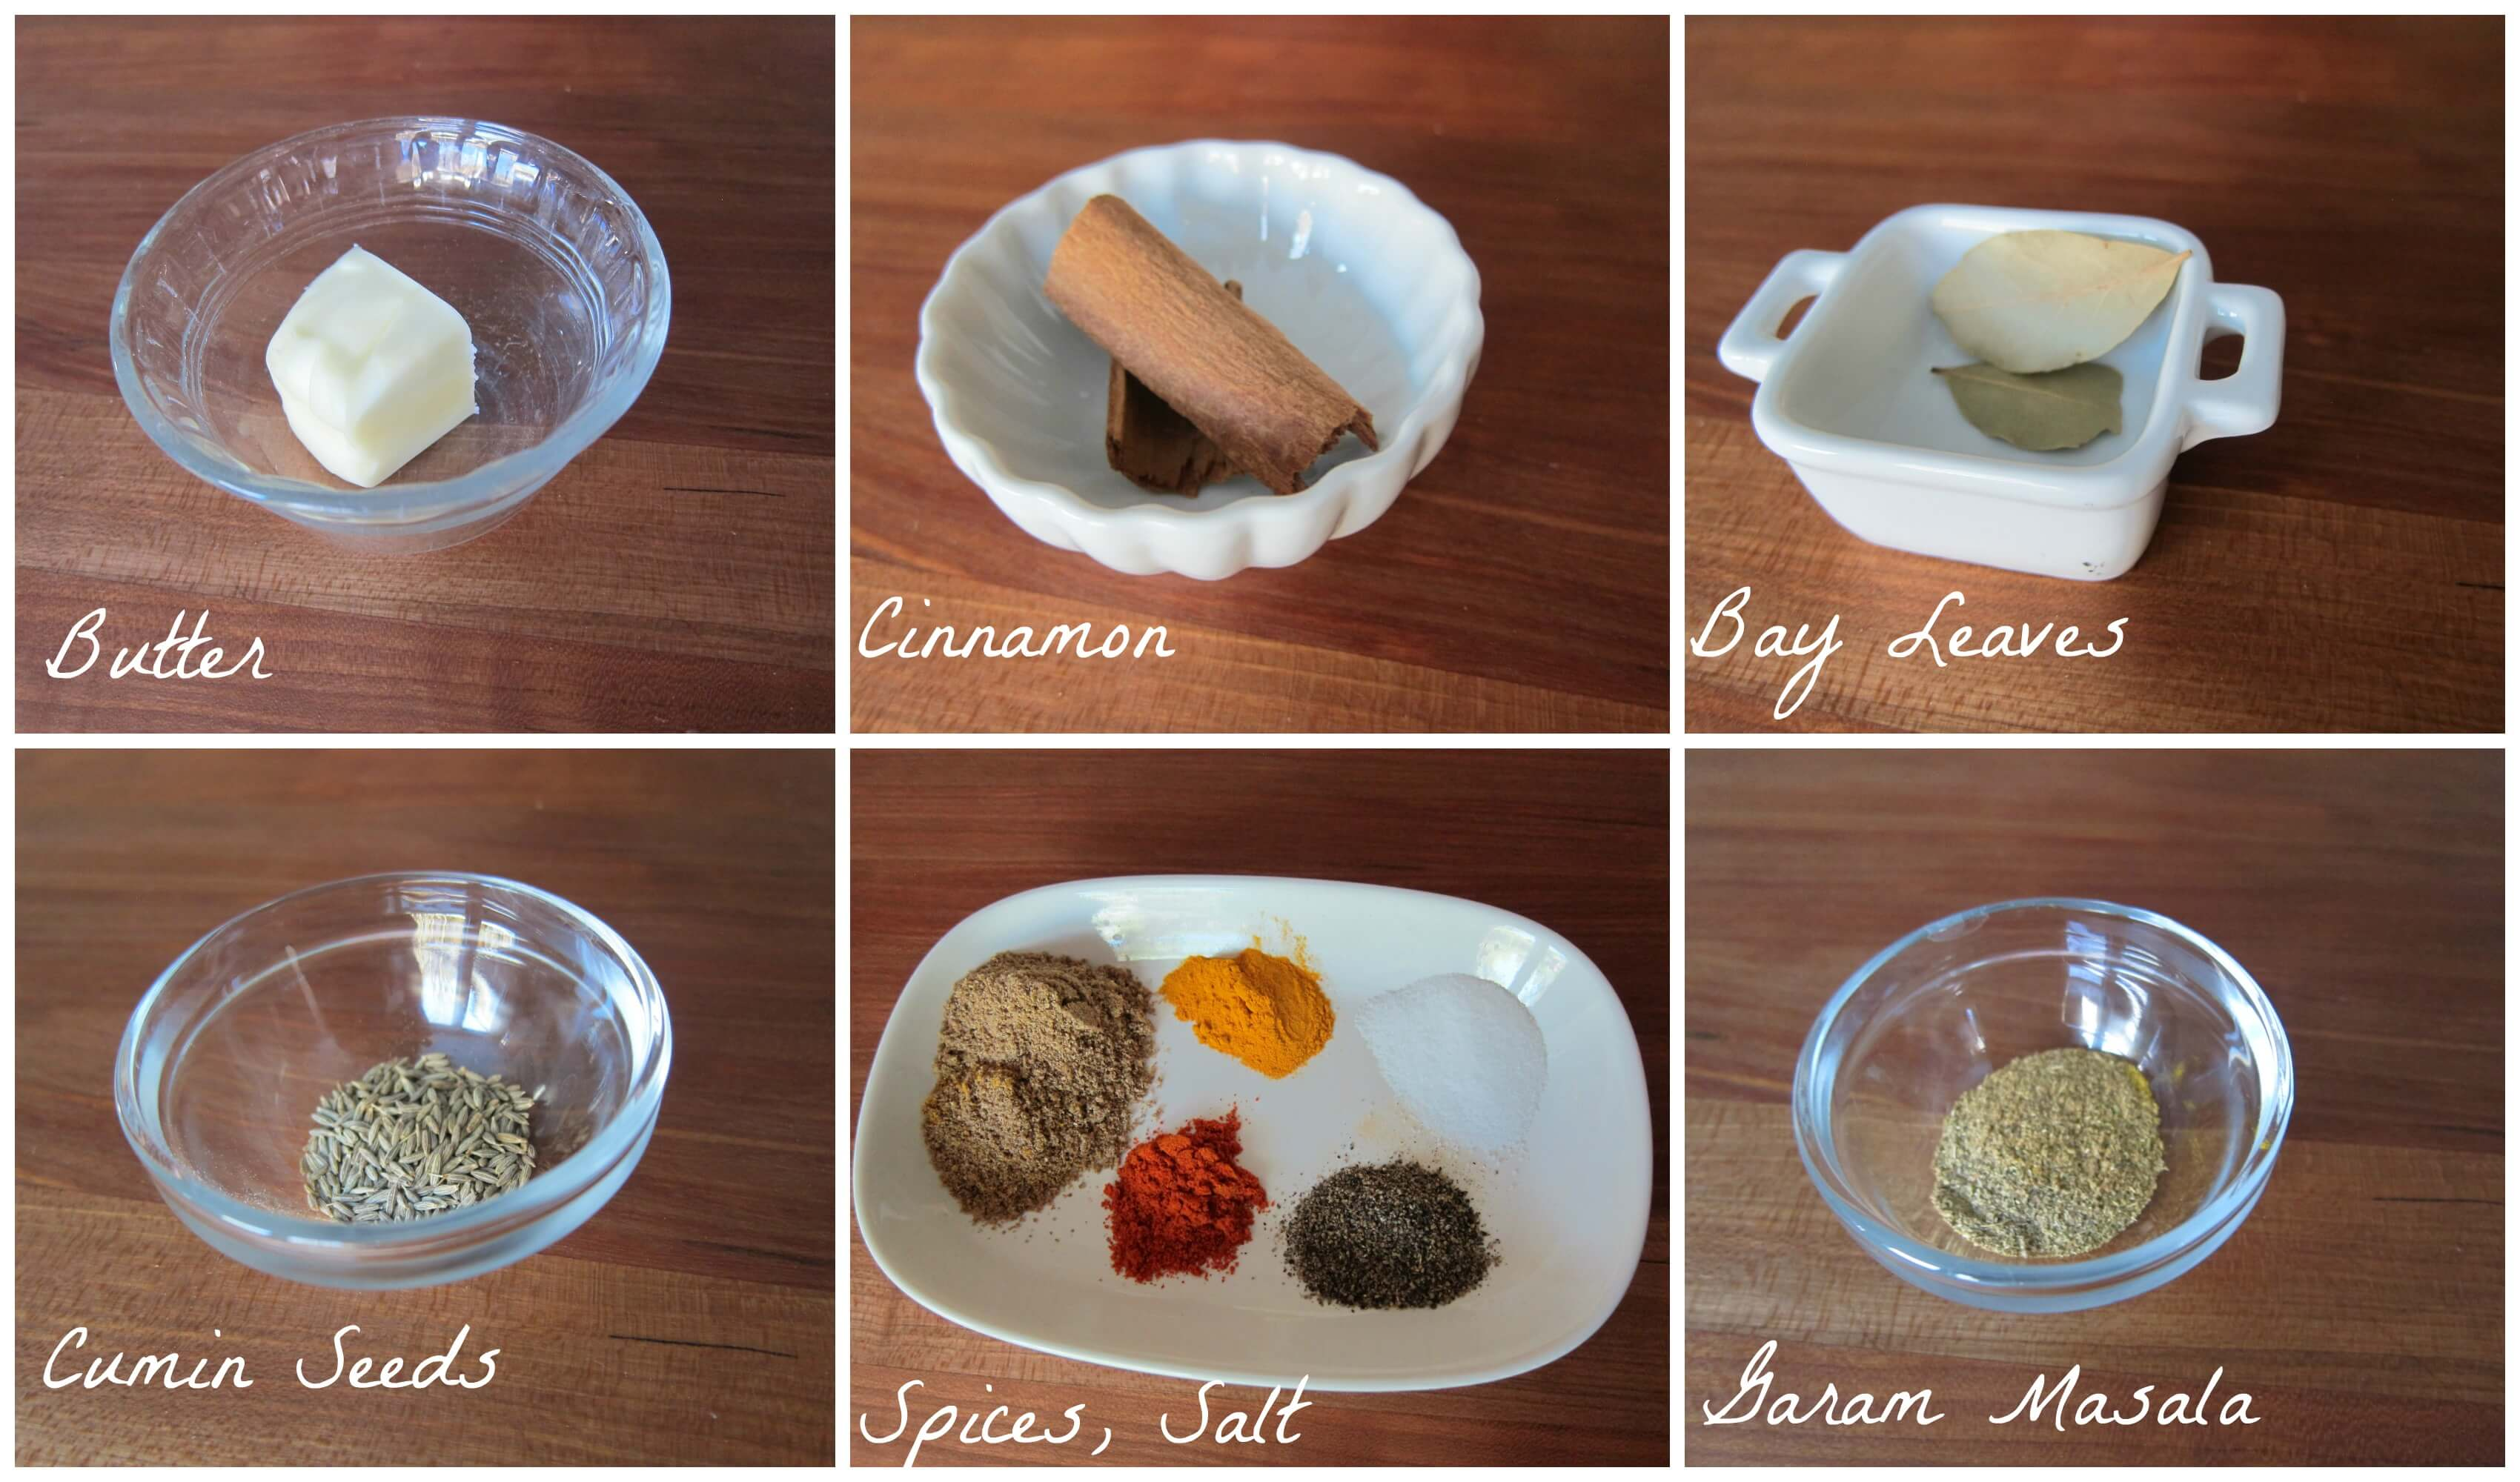 Instant Pot chiicken curry ingredients - butter, cinnamon, bay leaves, cumin seeds, spices, salt, garam masala